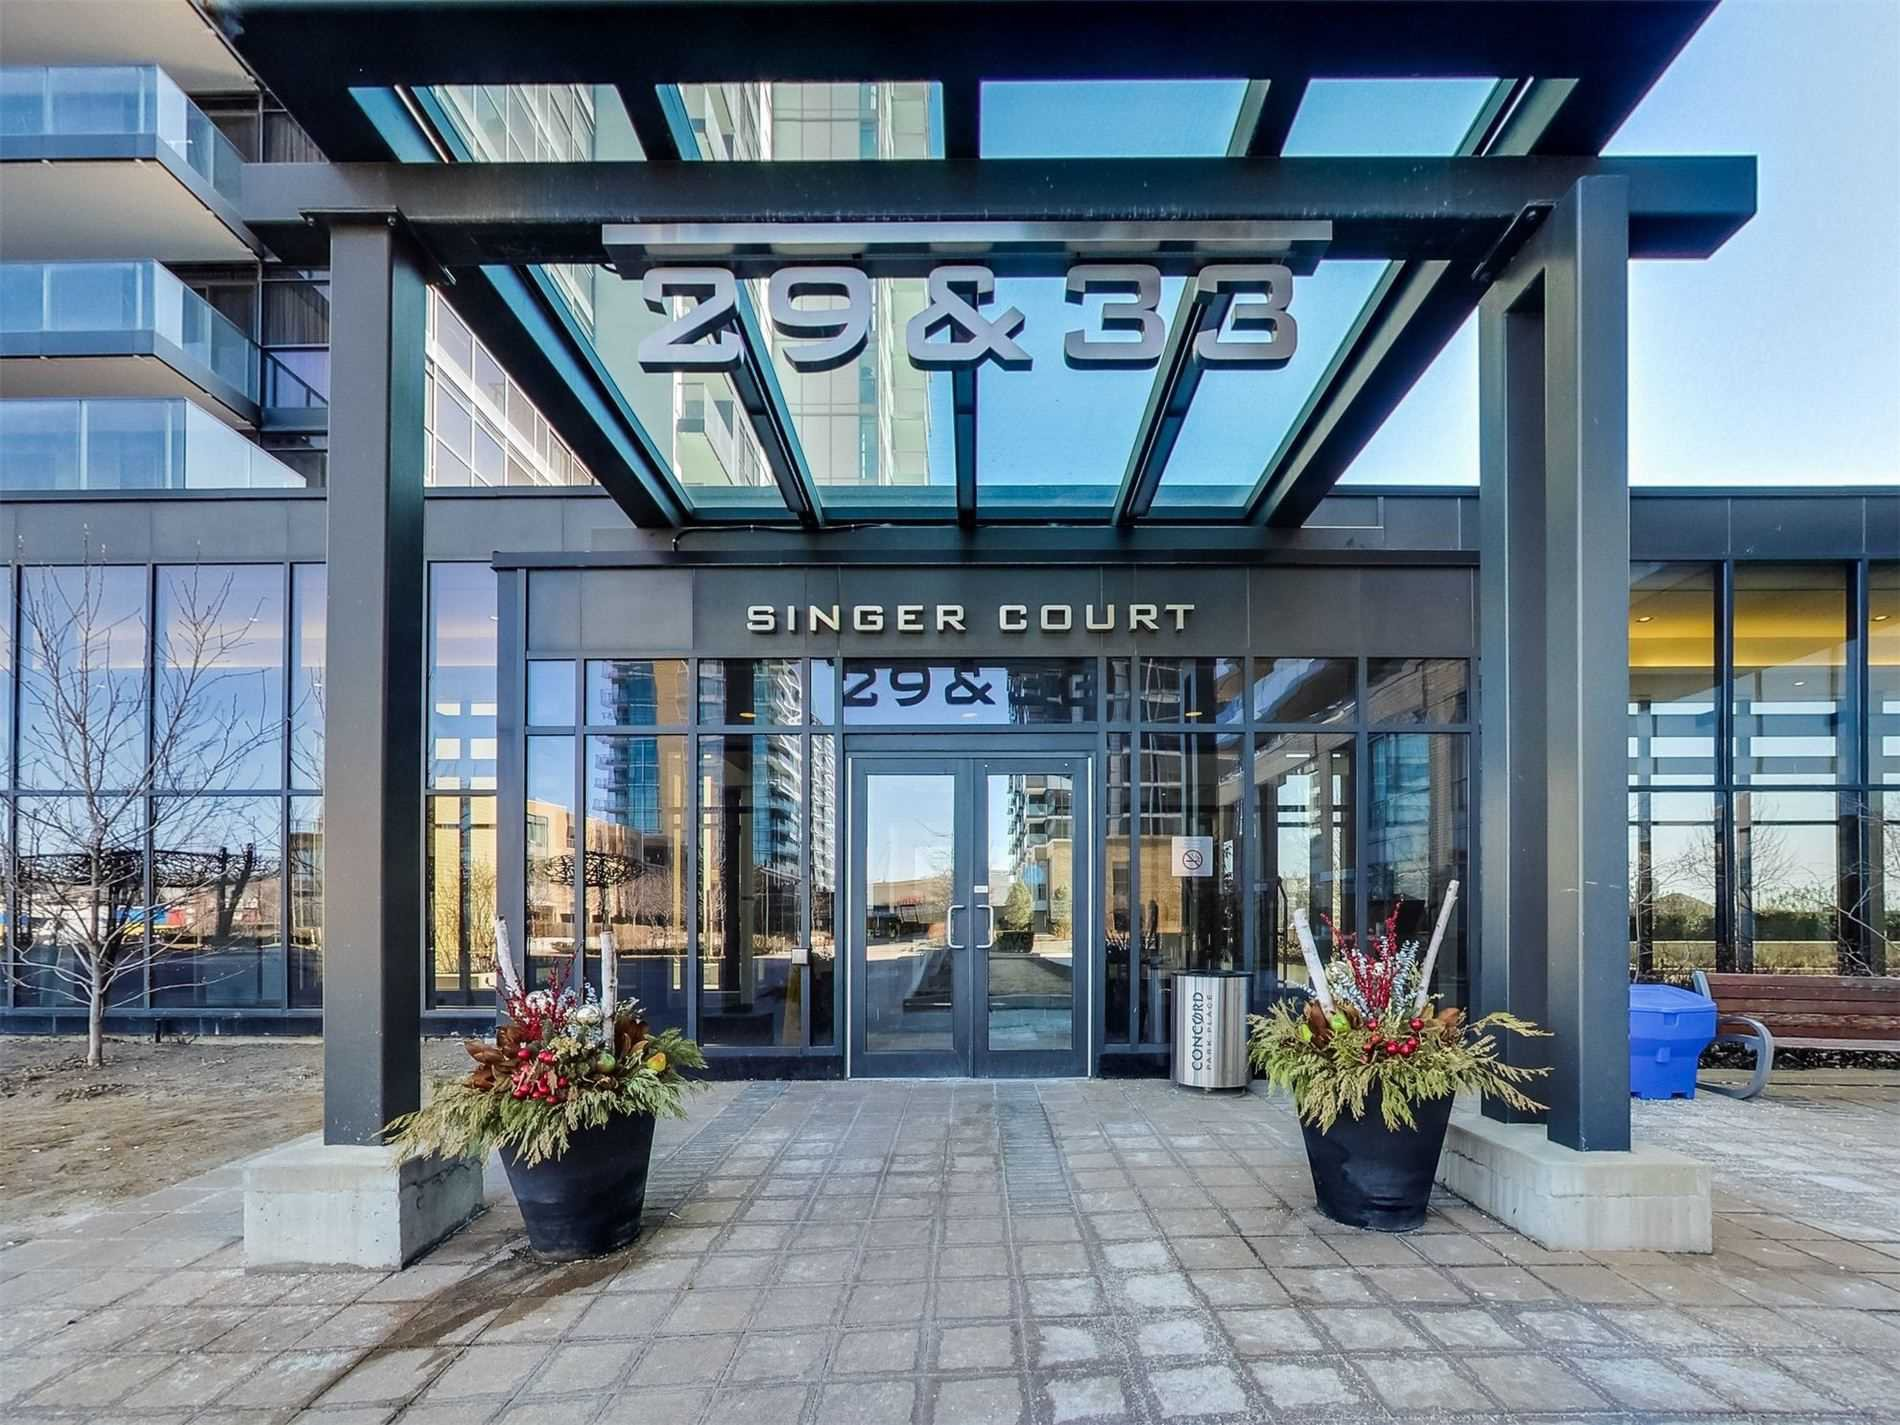 Photo 20: Photos: 501 29 Singer Court in Toronto: Bayview Village Condo for sale (Toronto C15)  : MLS®# C4614510